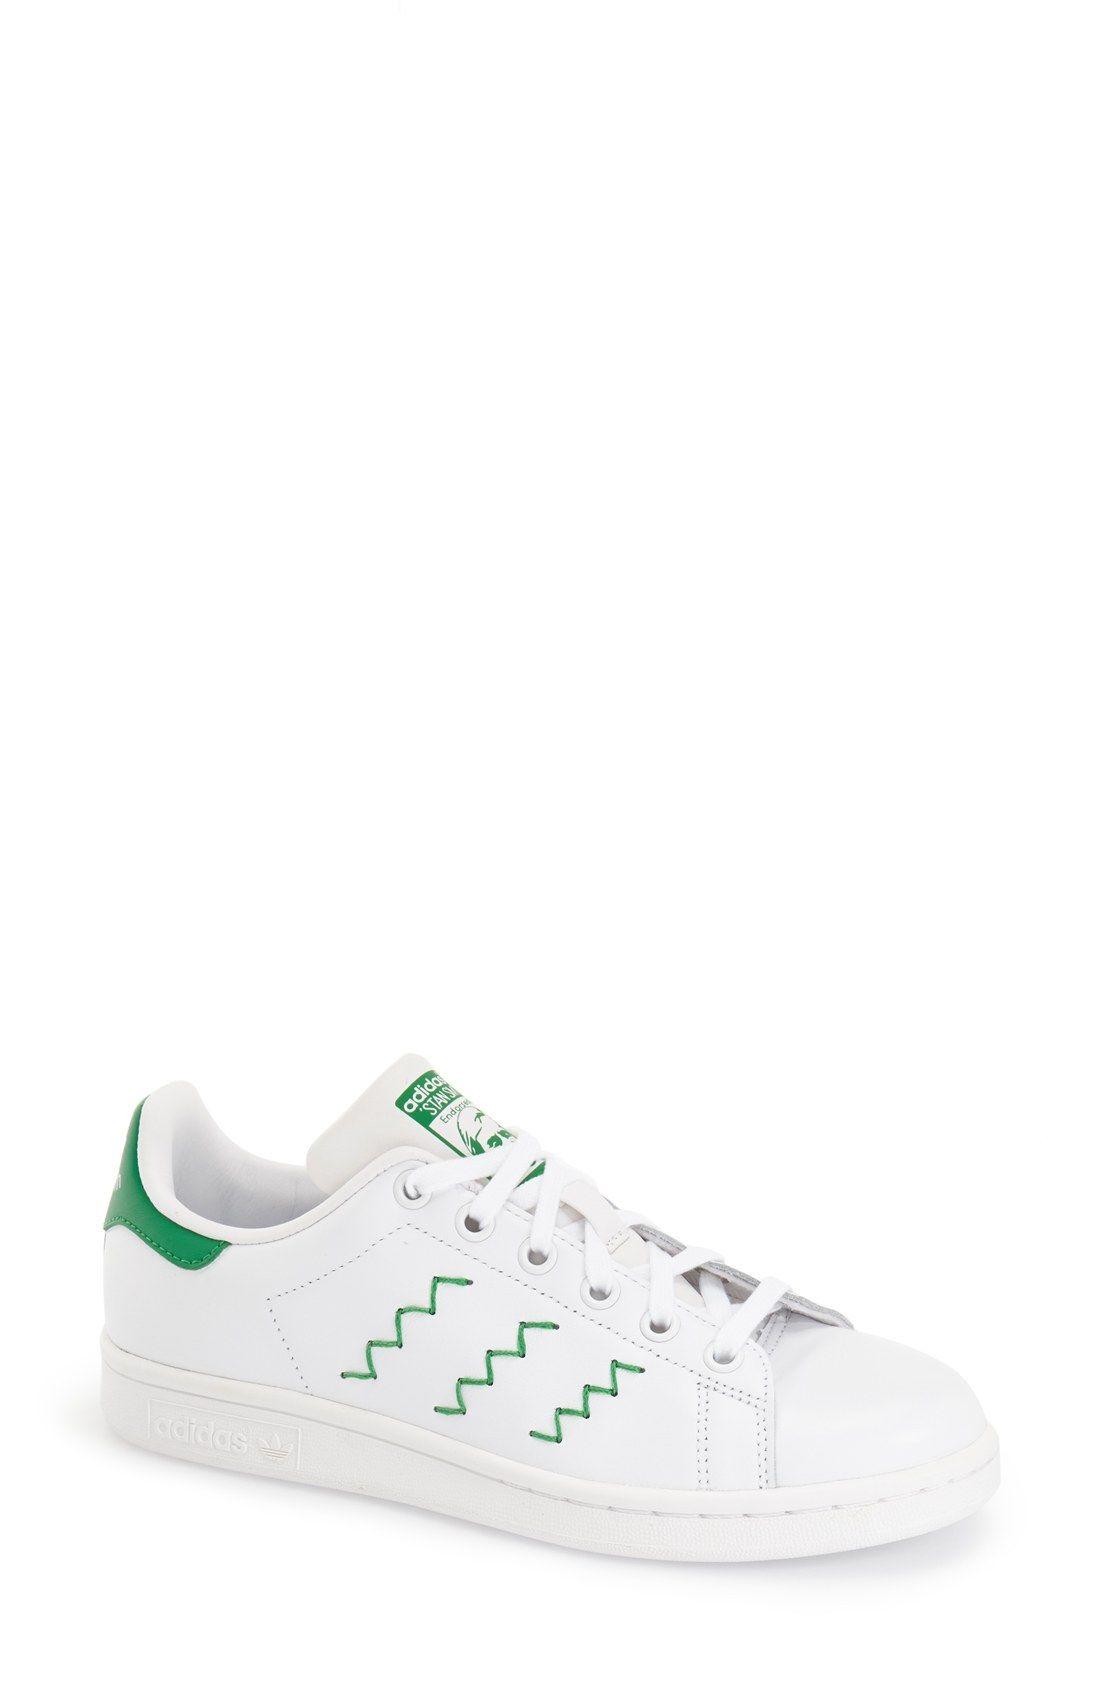 b001fb9c0fa adidas 'Stan Smith' Sneaker (Women) | Schoenen - Adidas stan smith ...